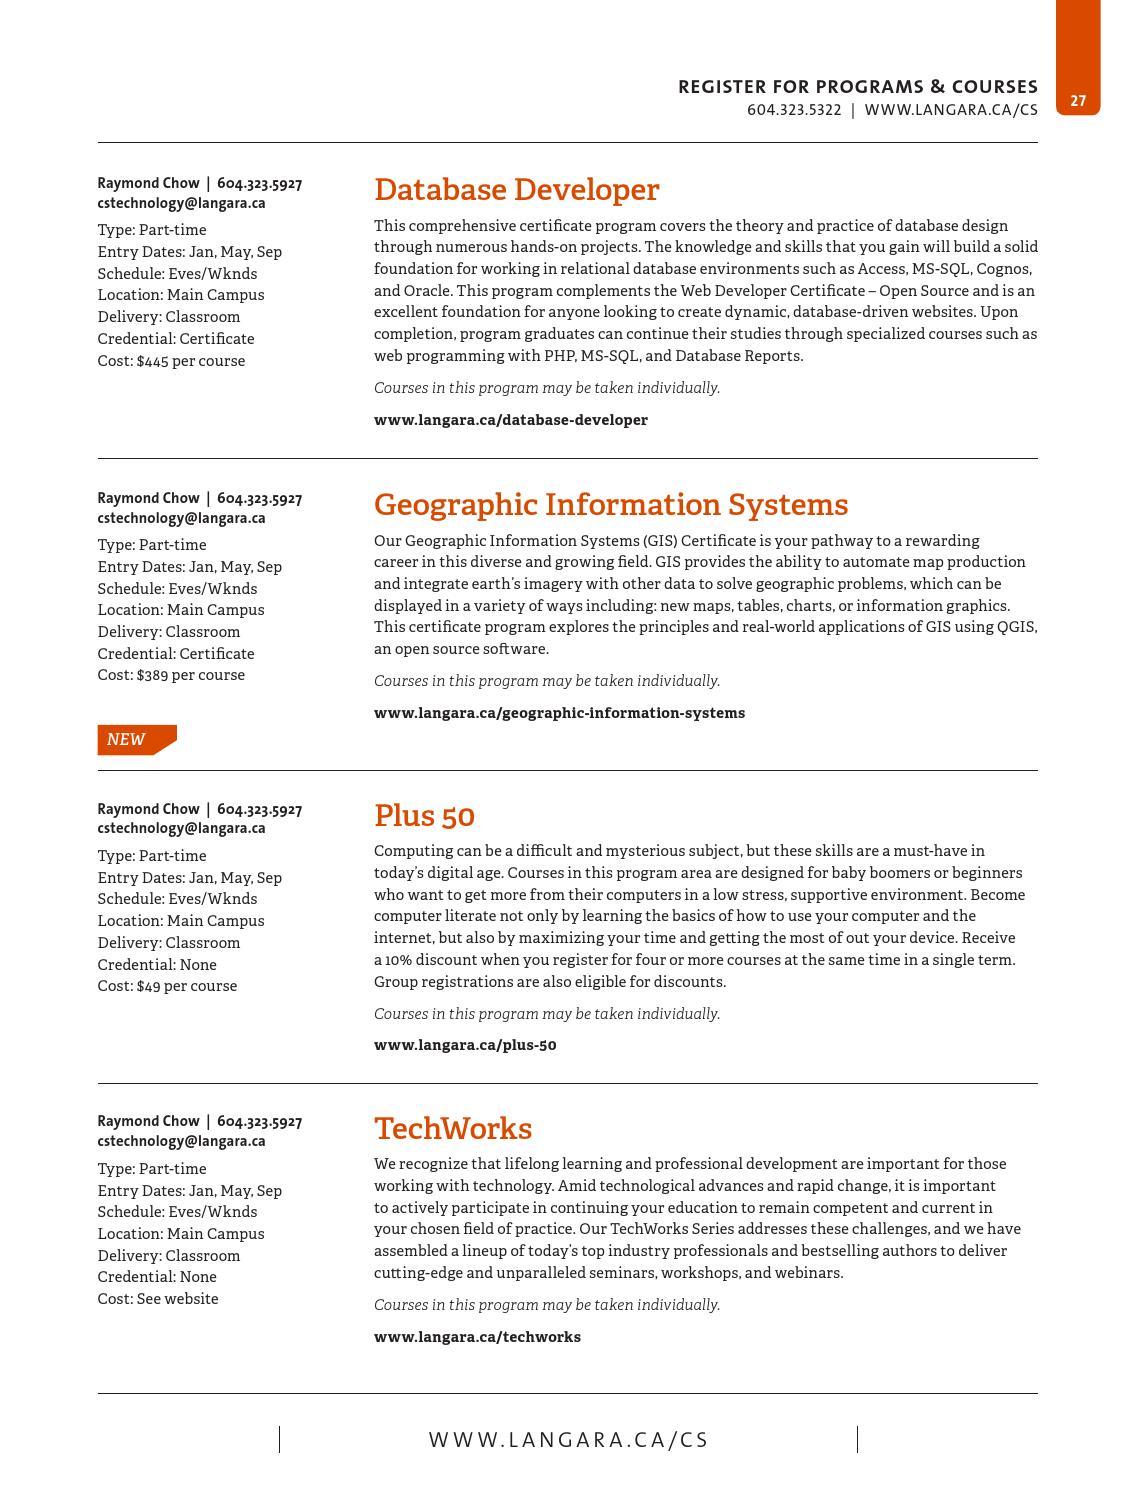 Continuing studies guidebook jan apr 2016 by langara college continuing studies guidebook jan apr 2016 by langara college issuu 1betcityfo Gallery